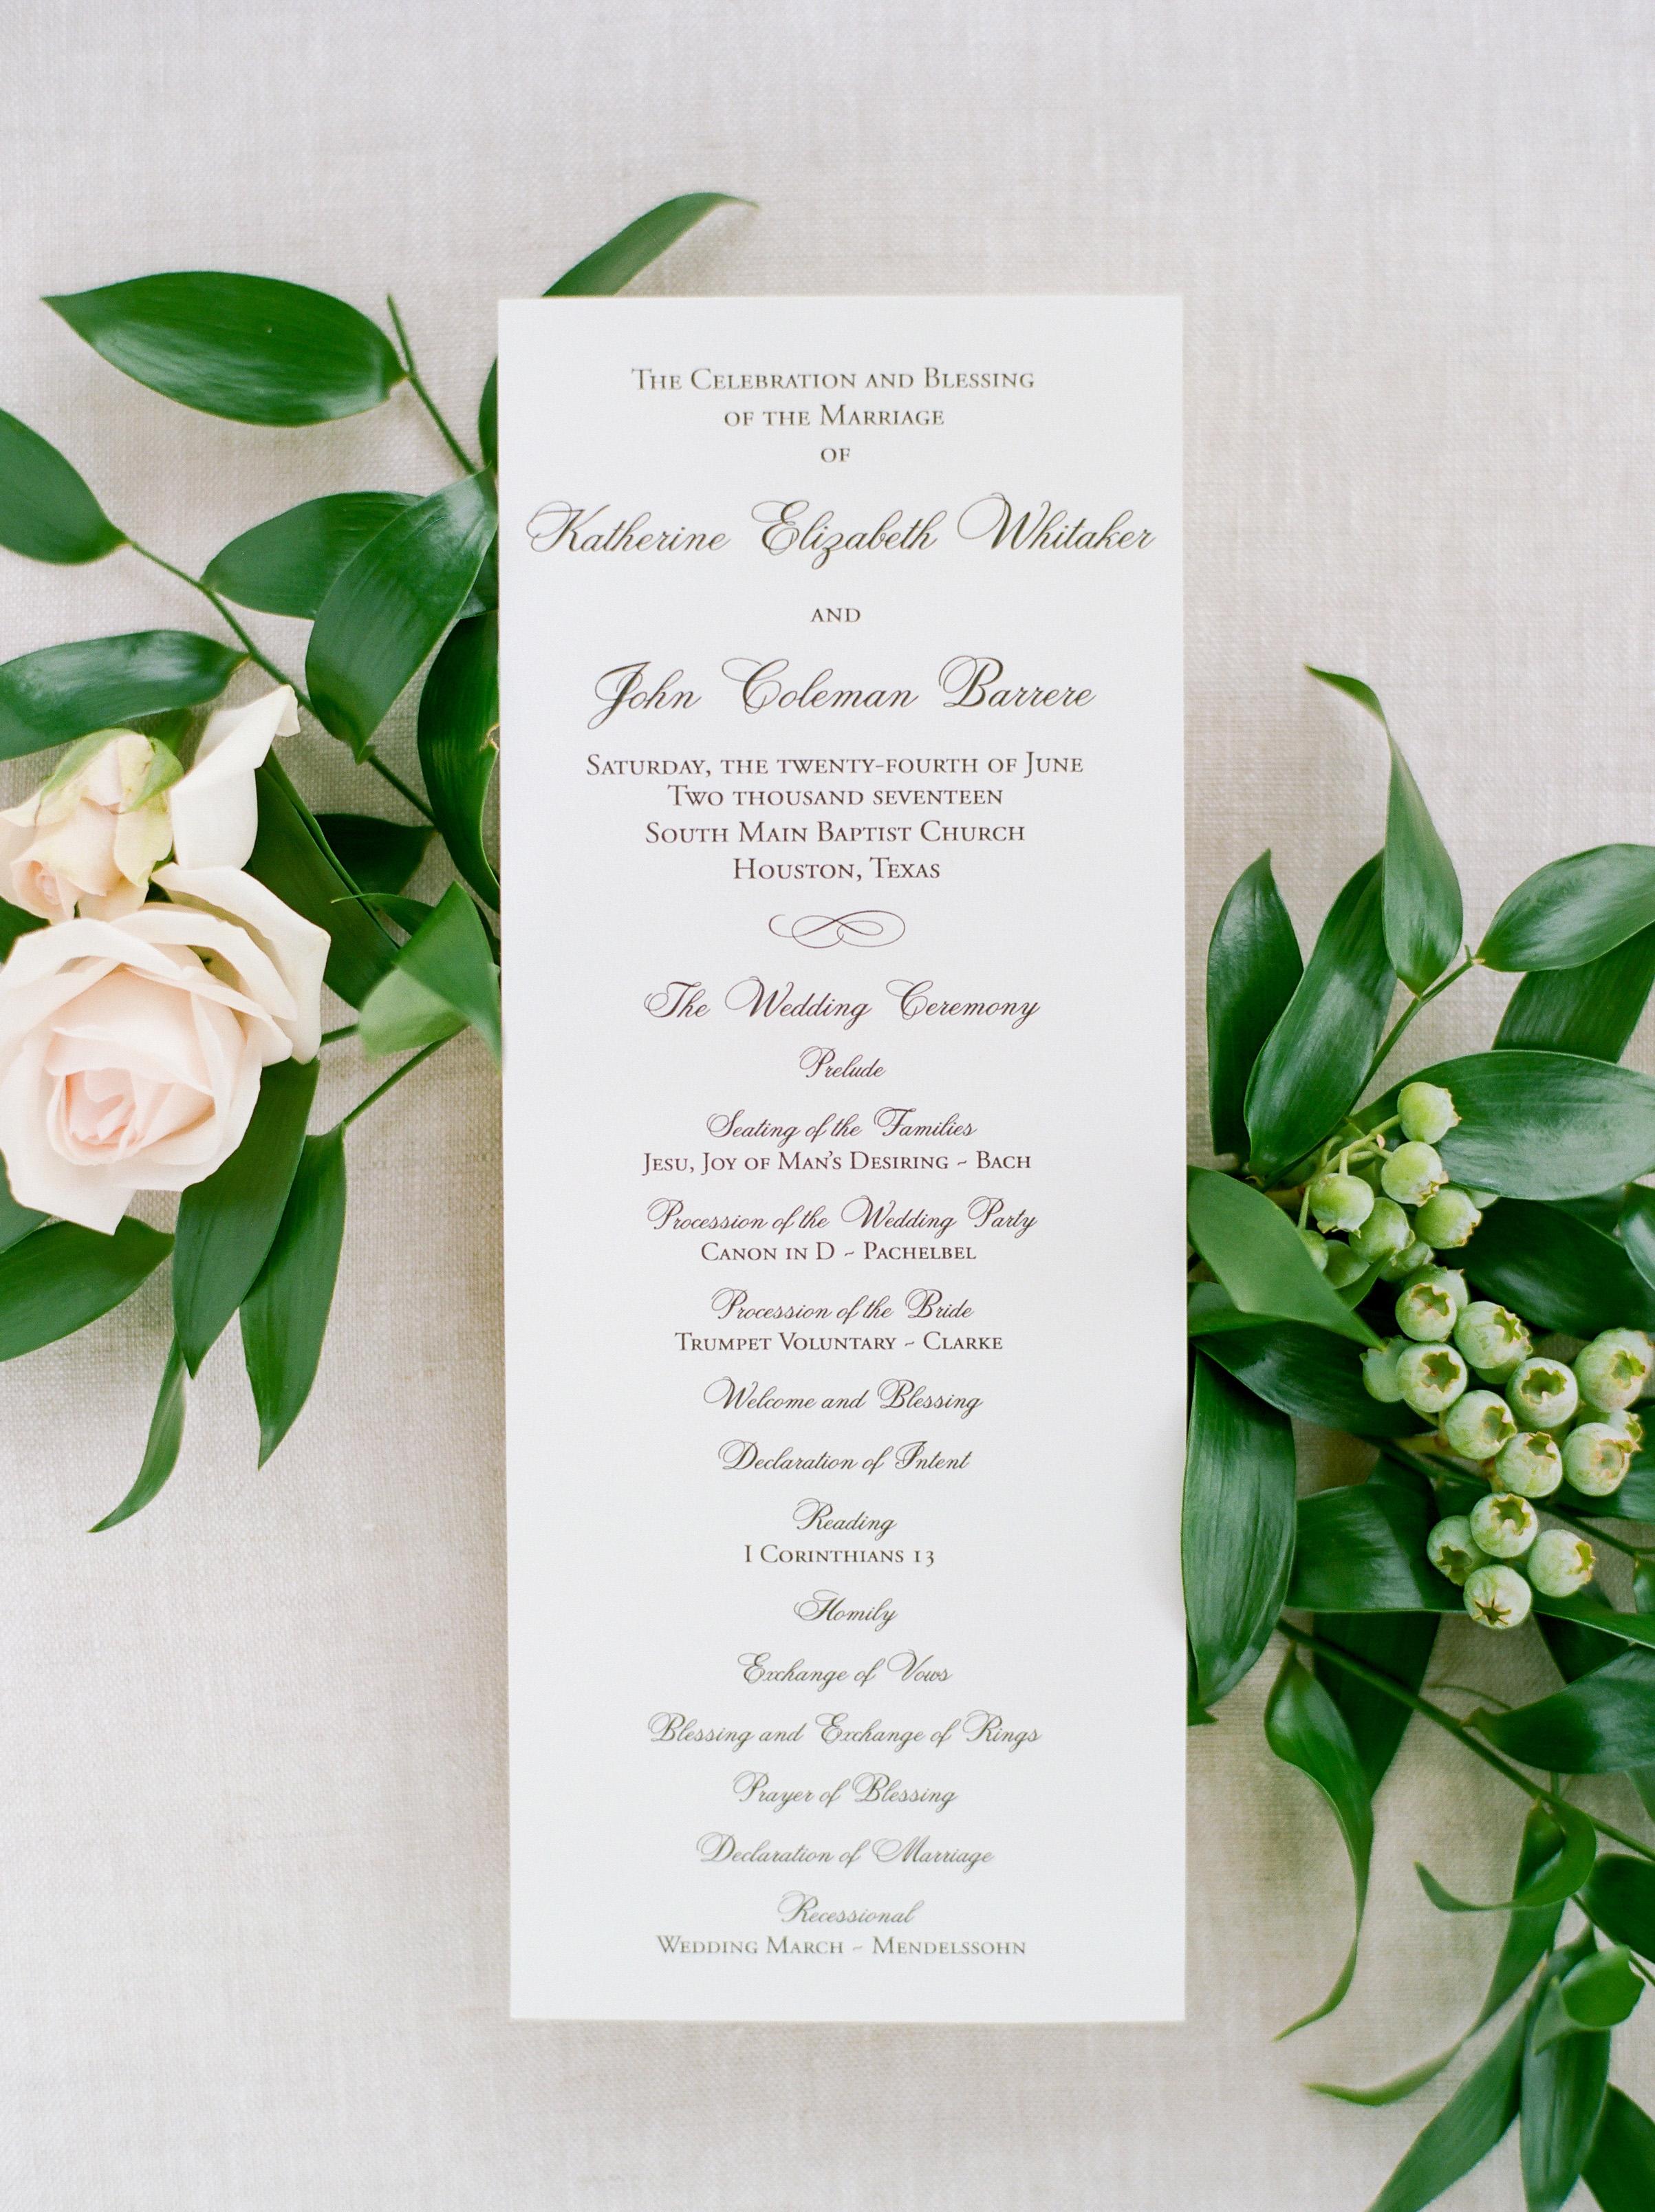 Fine-Art-Film-Houston-Wedding-Photographer-Best-Top-Luxury-Texas-Austin-Dallas-Destination-Dana-Fernandez-Photography-River-Oaks-Country-Club-South-Main-Baptist-Ceremony-Reception-Wedding-20.jpg